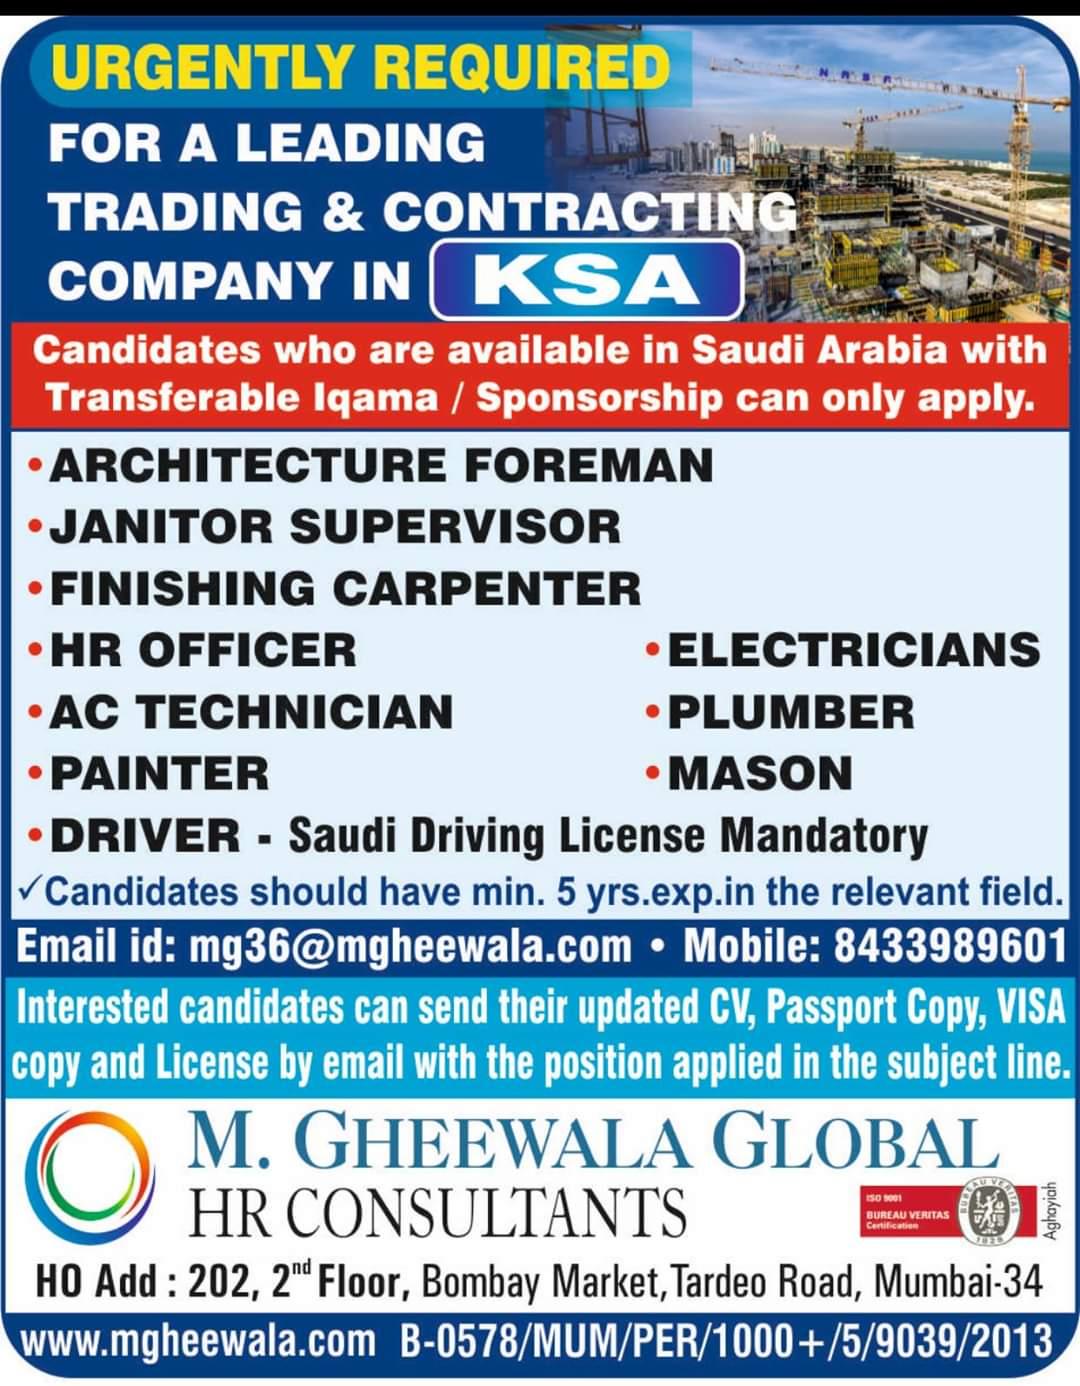 URGENT REQUIREMENT FOR SAUDI ARABIA